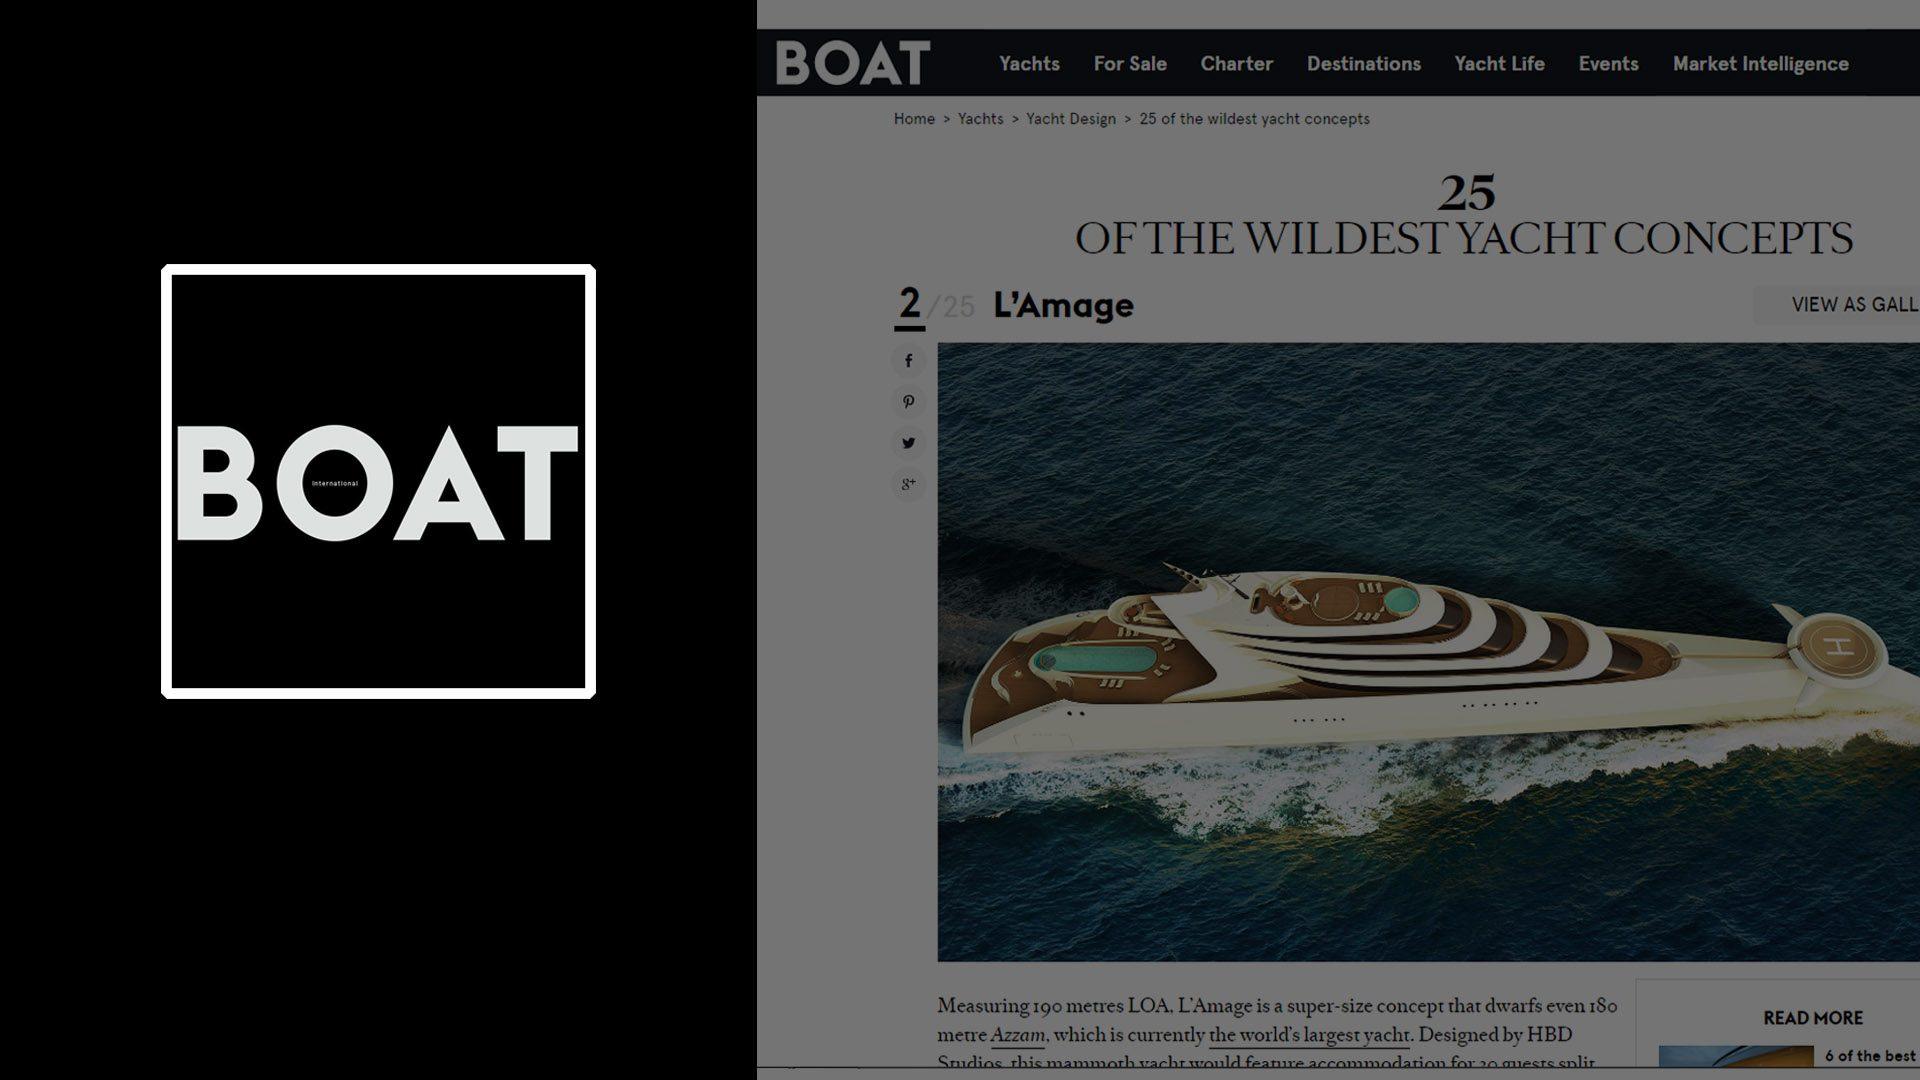 Superyacht L'Amage concept design by Hamid Bekradi featured on BOAT International magazine